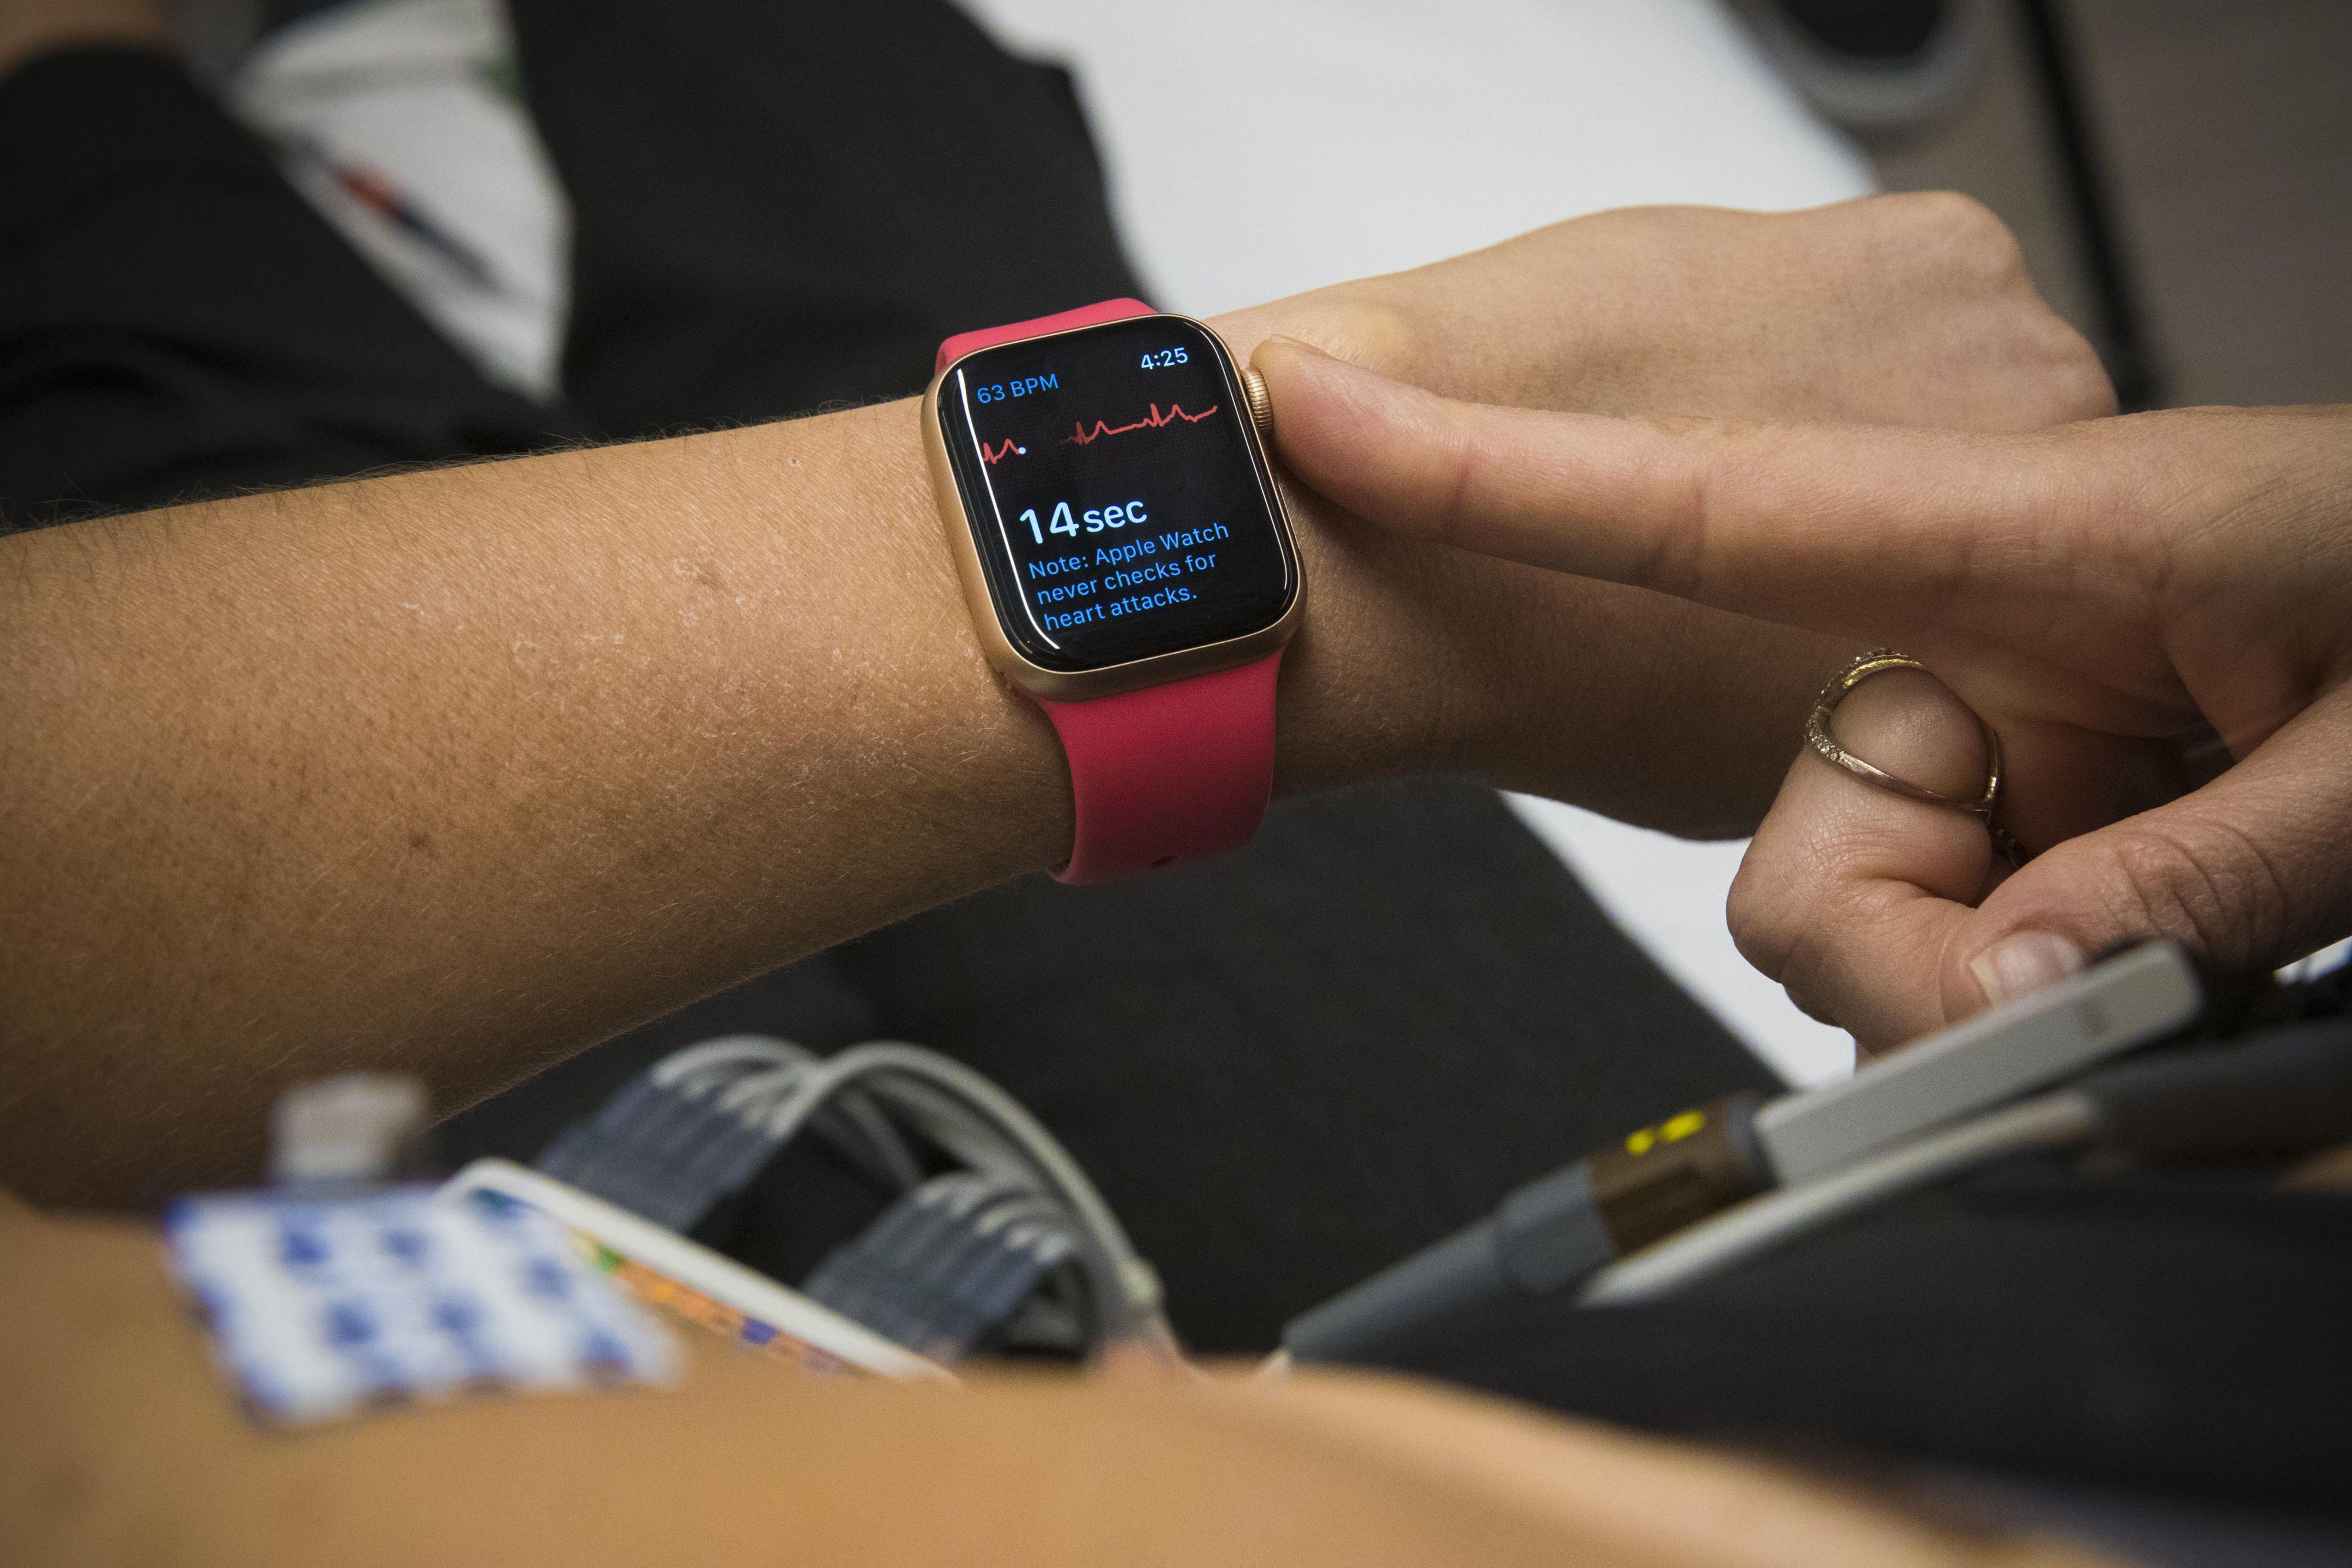 vanessa-hand-health-apple-watch-ekg-electrocardiogram-9681